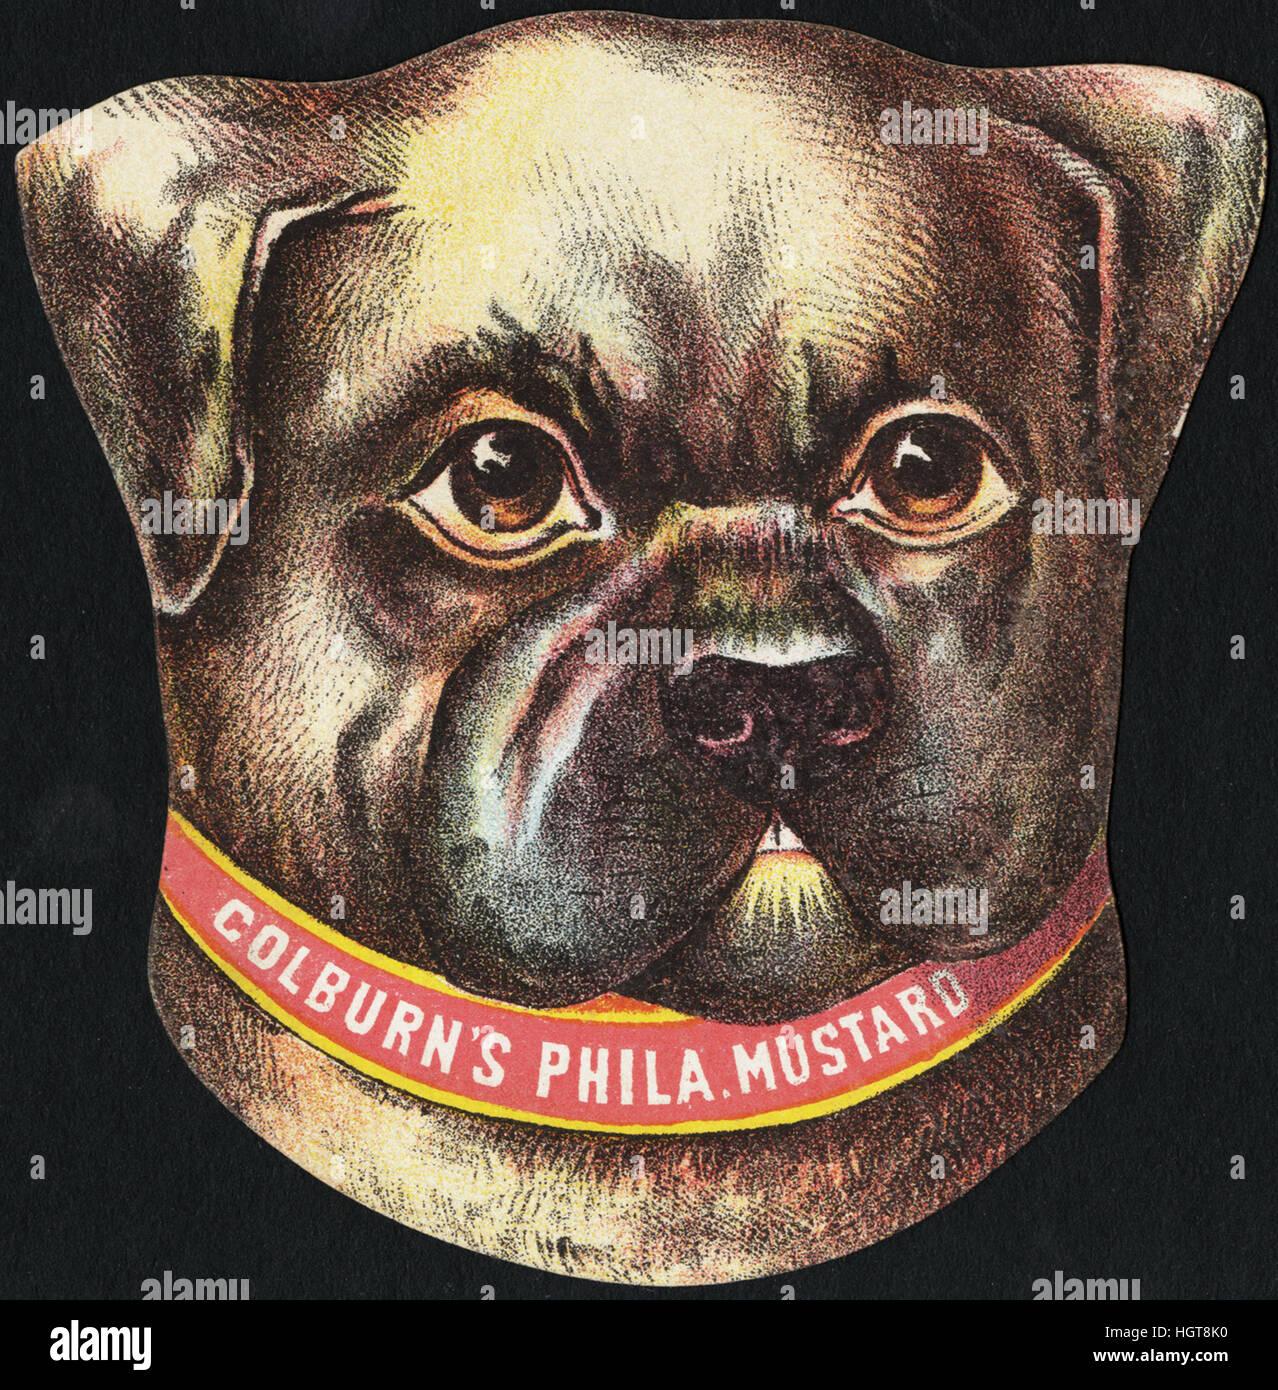 Colburn's Phila. Mustard [front]  - Food Trade Card - Stock Image